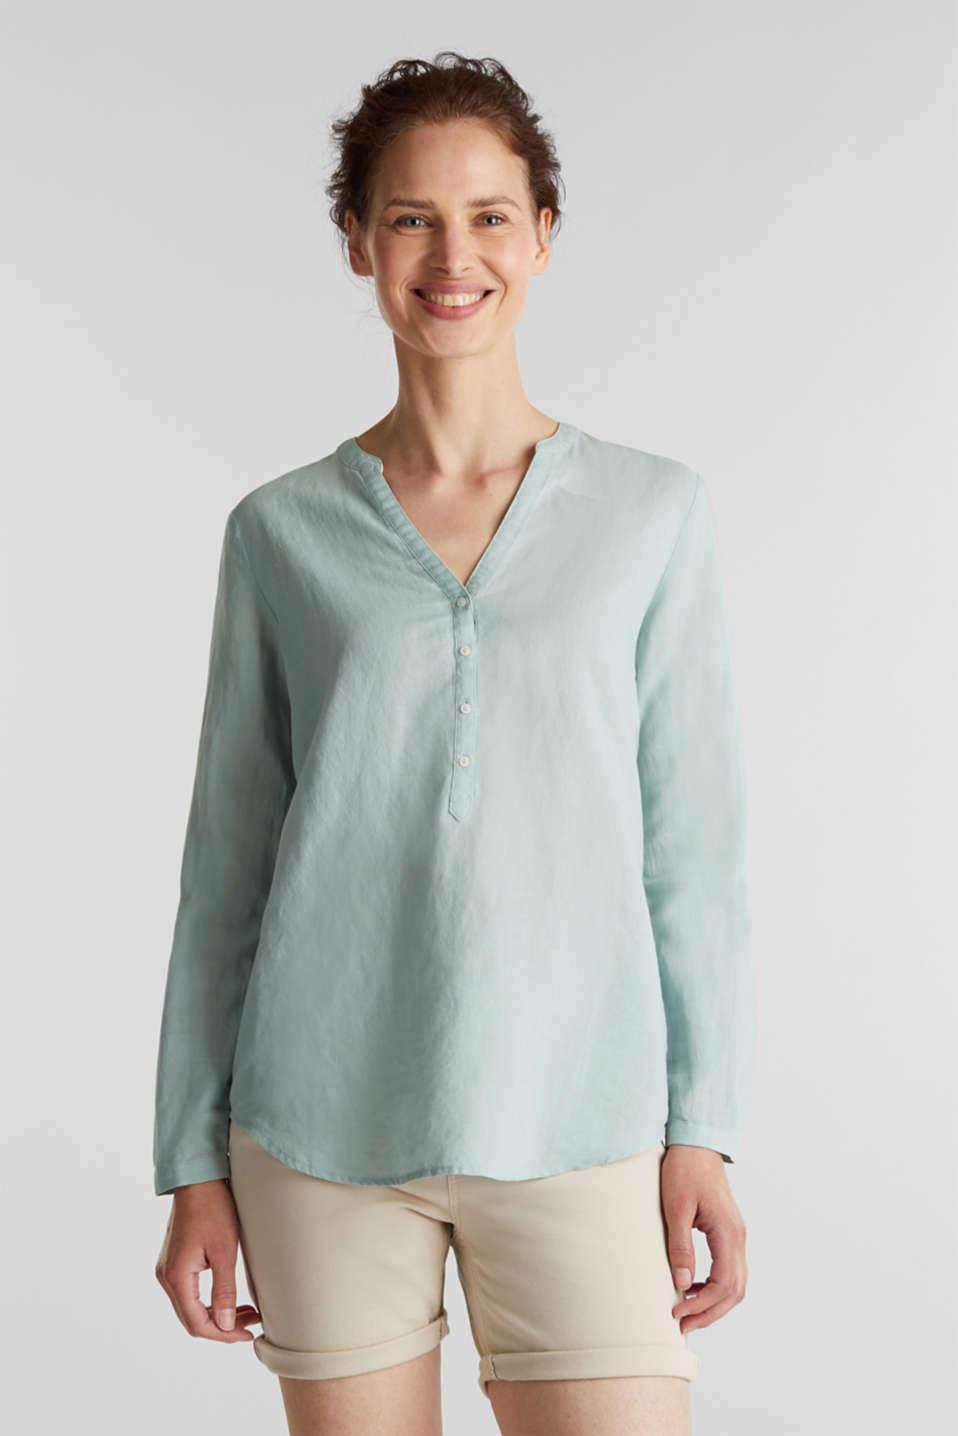 Turn-up blouse in blended linen, LIGHT AQUA GREEN, detail image number 0